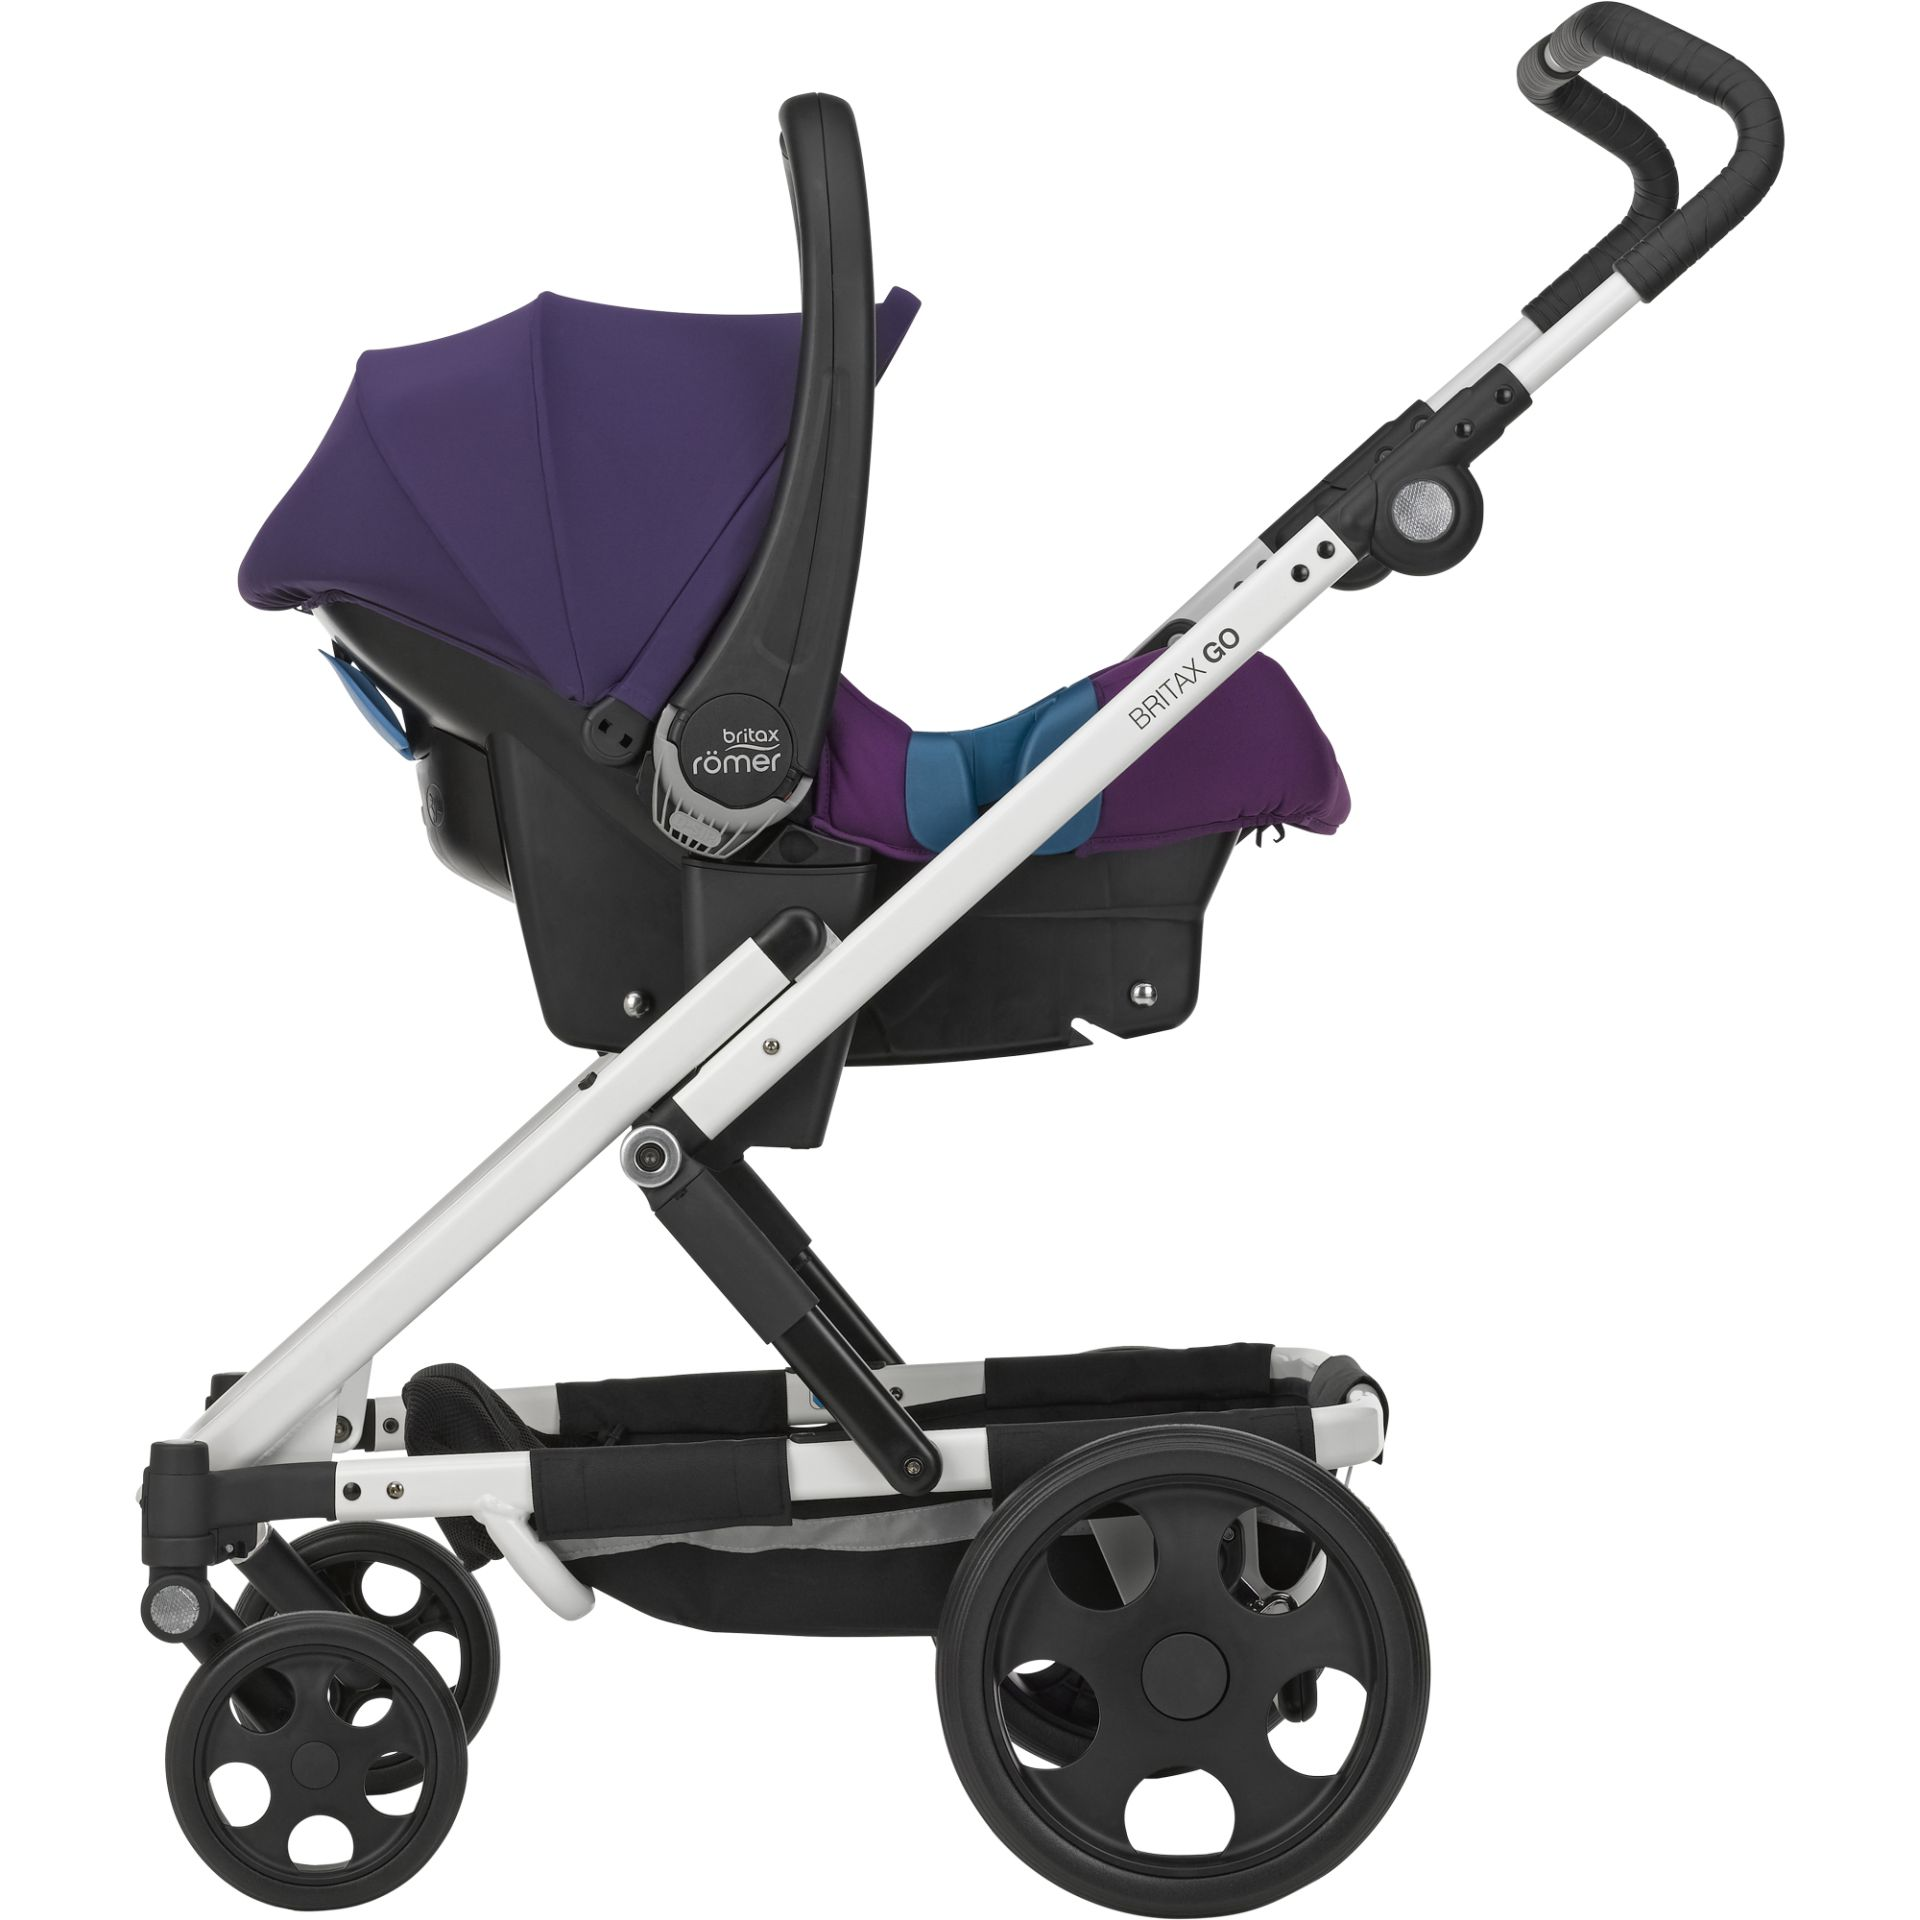 britax r mer go inkl go kinderwagen aufsatz babyschale. Black Bedroom Furniture Sets. Home Design Ideas